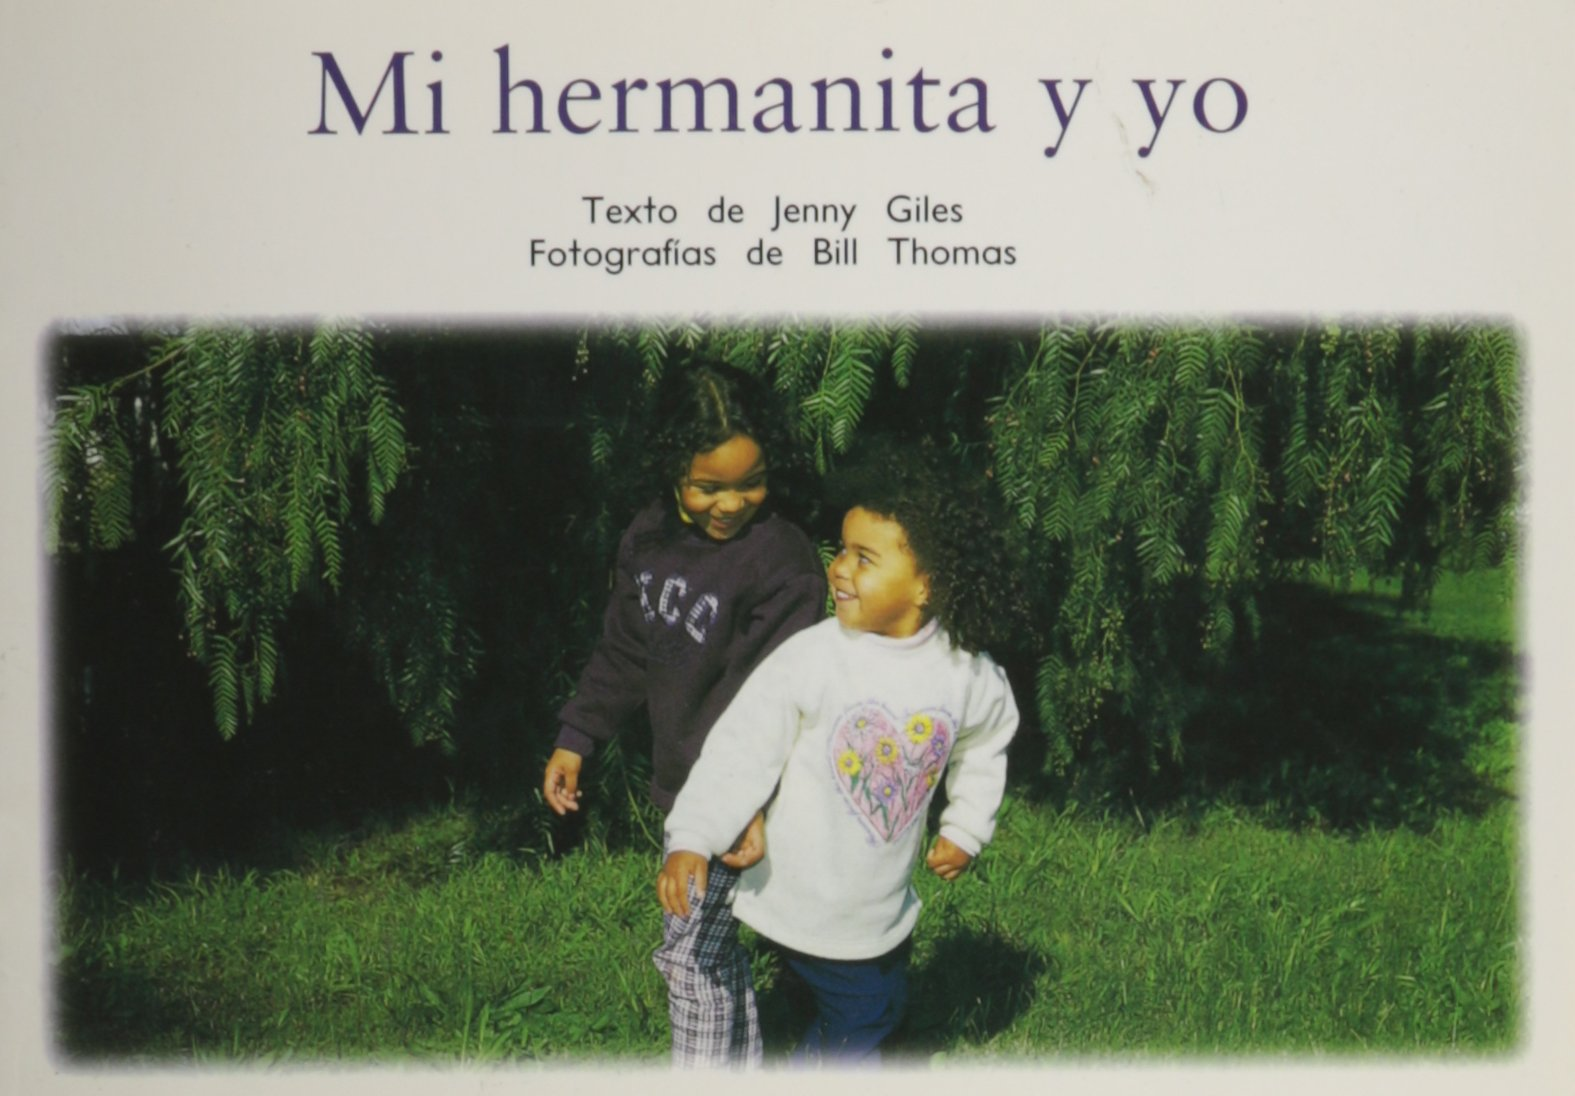 Download Rigby PM Coleccion: Individual Student Edition amarillo (yellow) Mi hermanita y yo (My Little Sister) (Spanish Edition) pdf